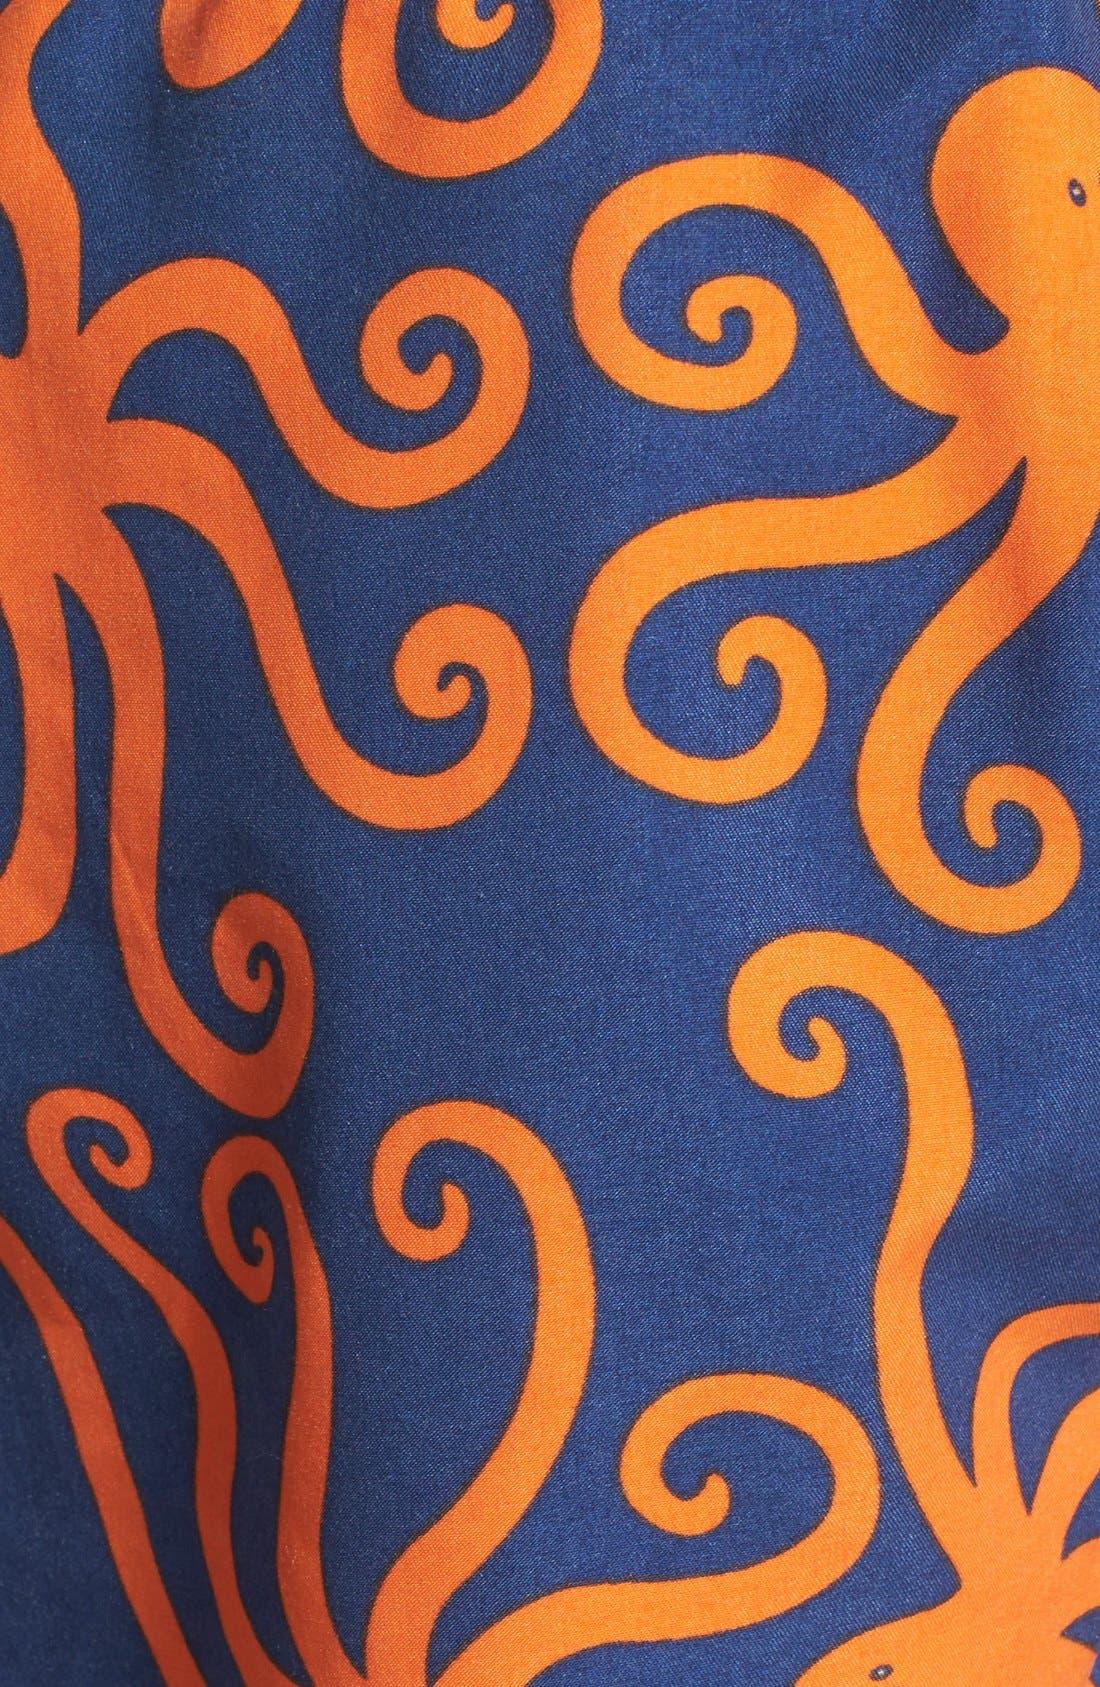 'Octopus Pattern' Swim Trunks,                             Alternate thumbnail 5, color,                             BLUE/ ORANGE